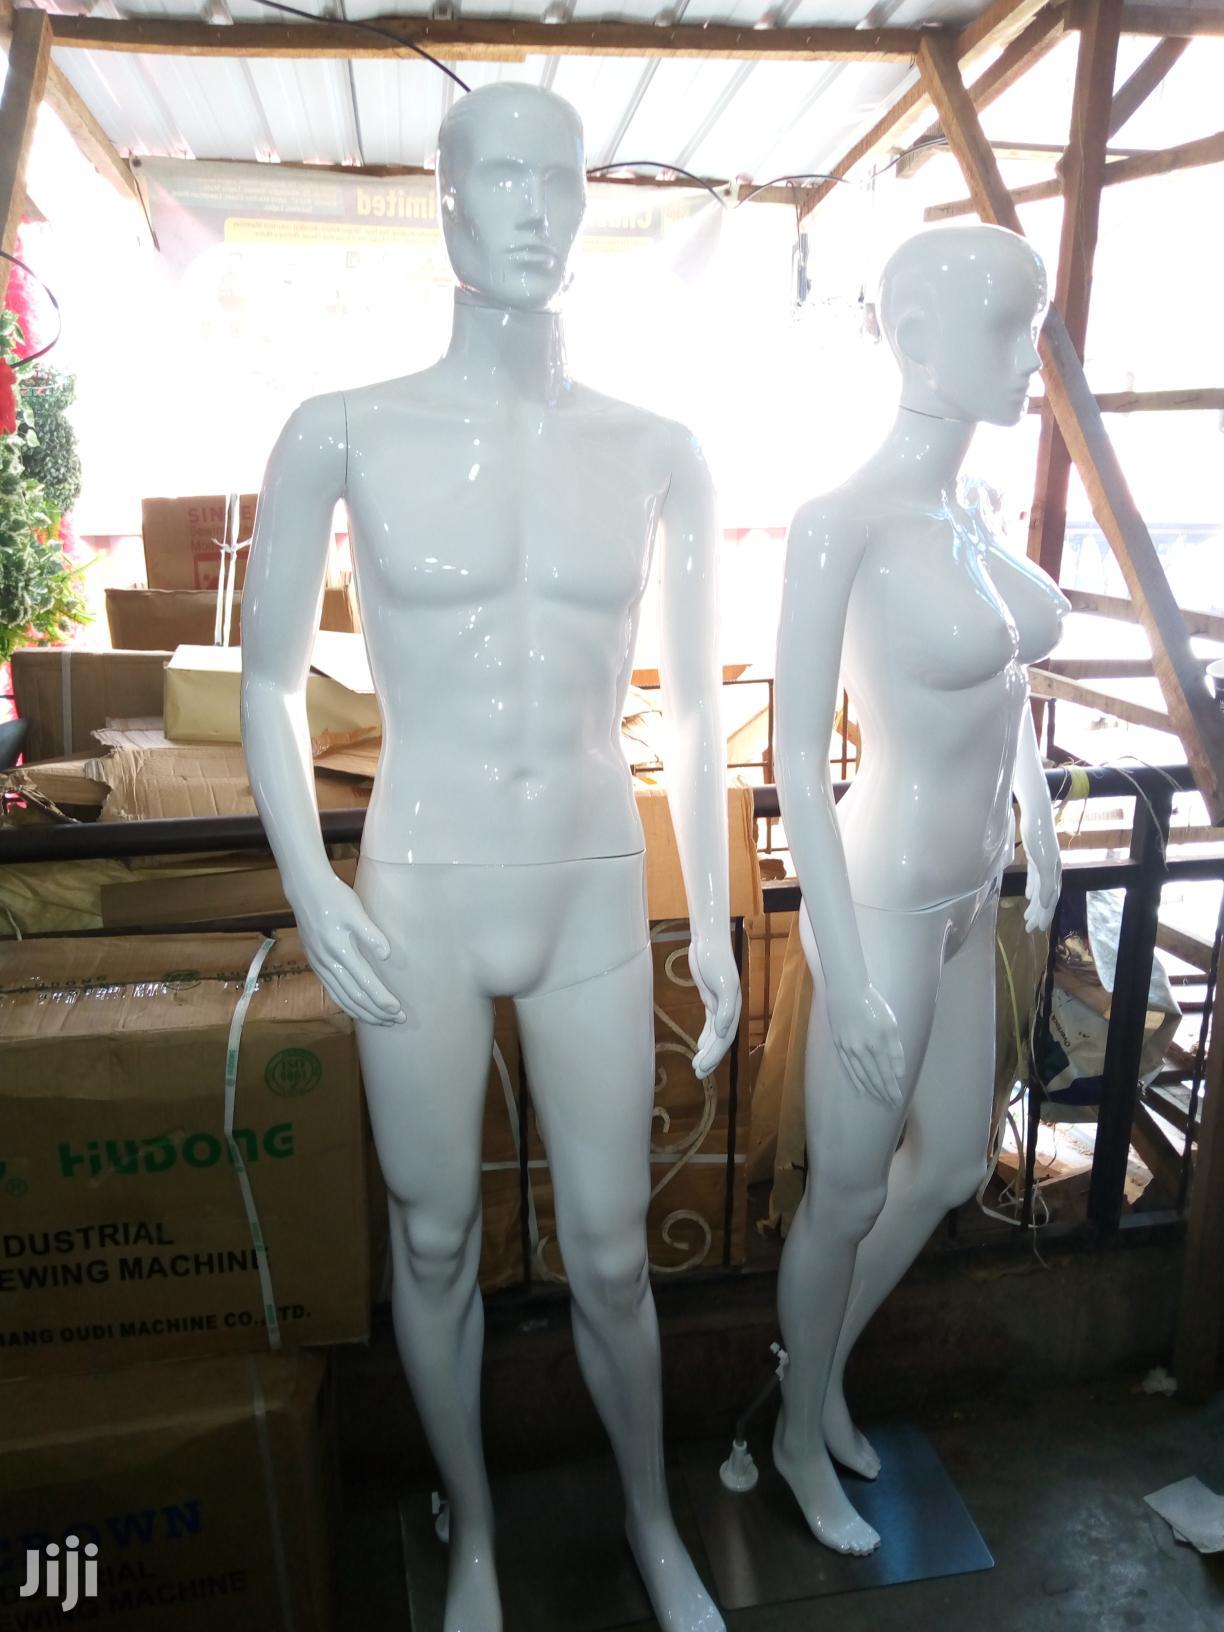 Male/Female Fiber,Donmy,Mannequine